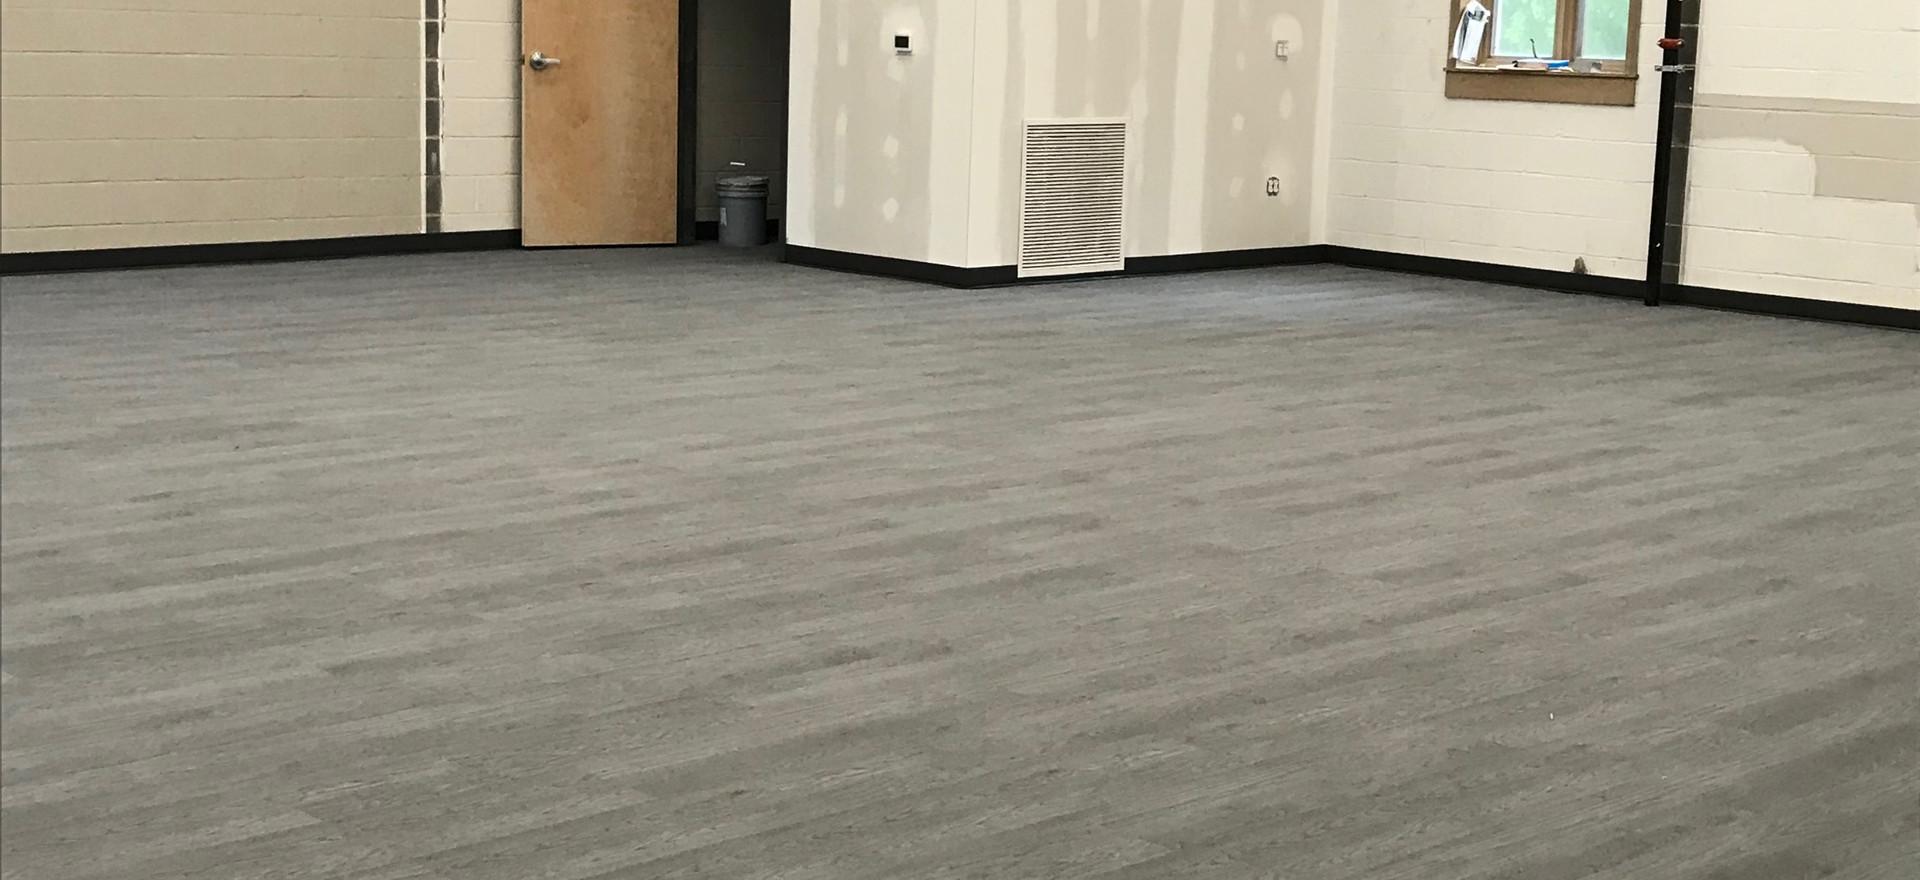 Fellowship Hall Flooring